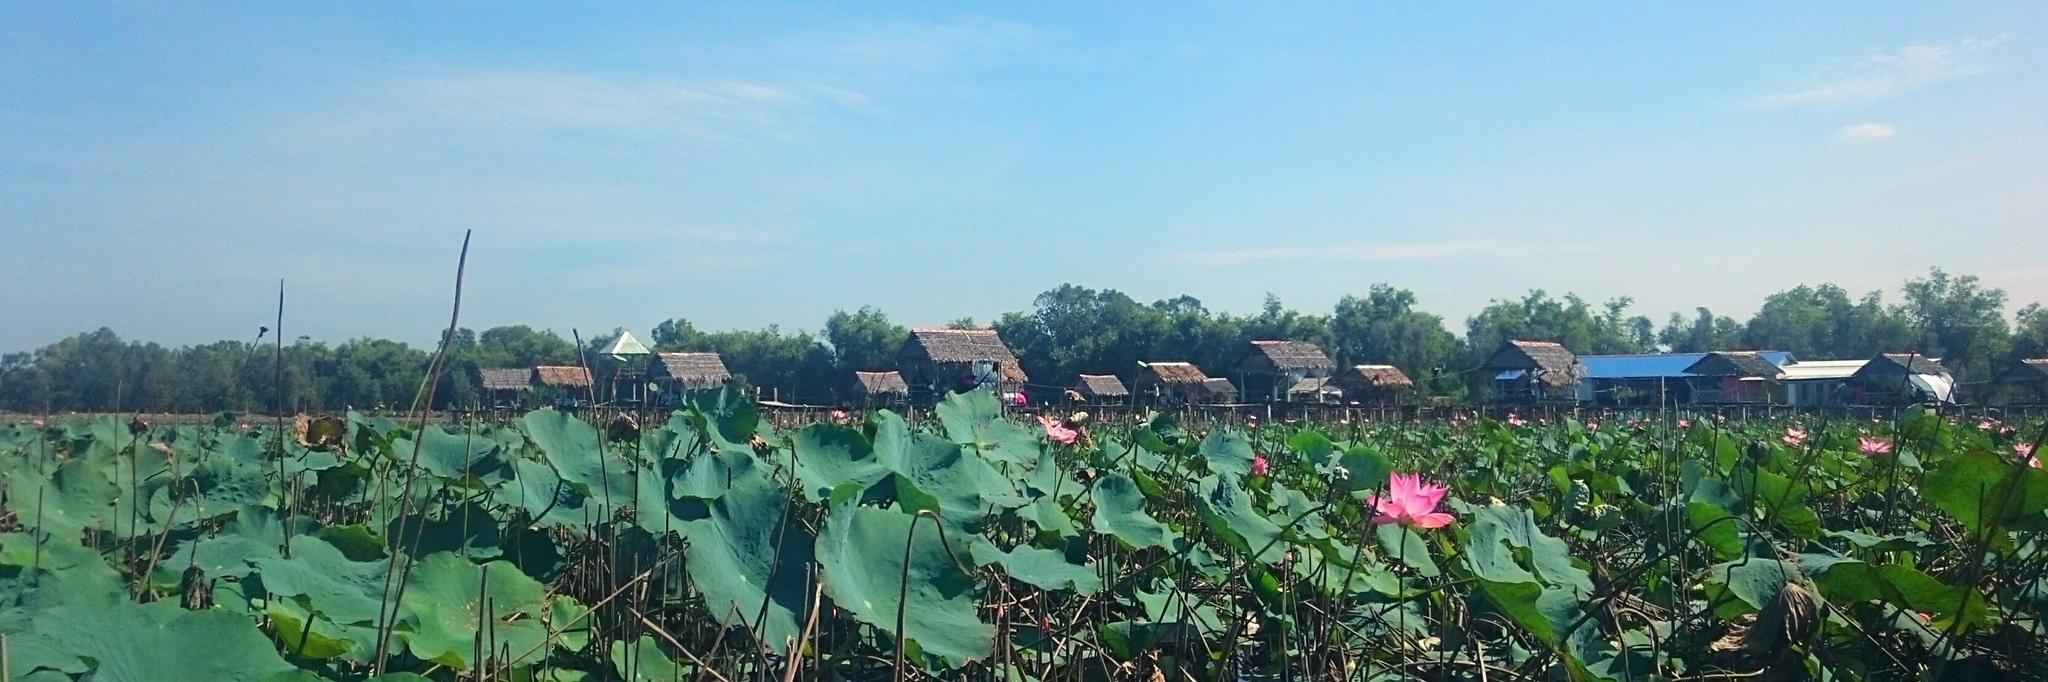 http://gody.vn/blog/trhgvhung.fa1924/post/vietnamsolo-thap-muoi-bat-ngat-sen-hong-967